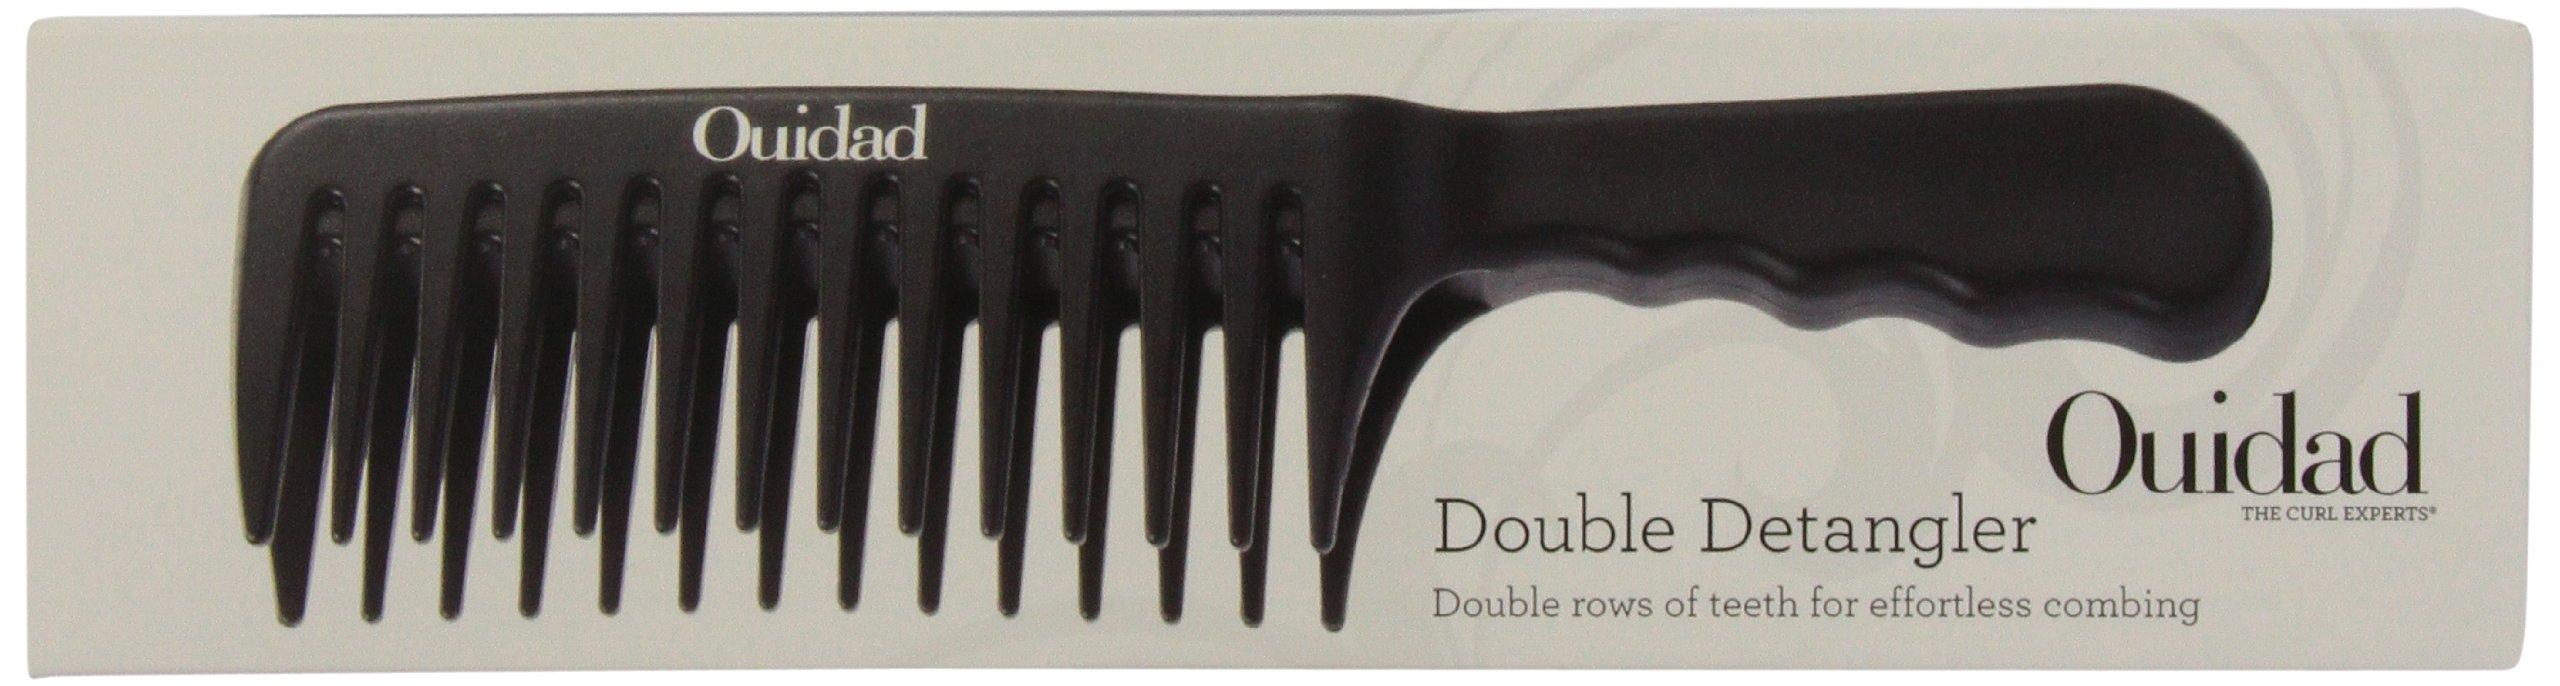 Ouidad Double Detangler Comb 1 Ea, 1 Count